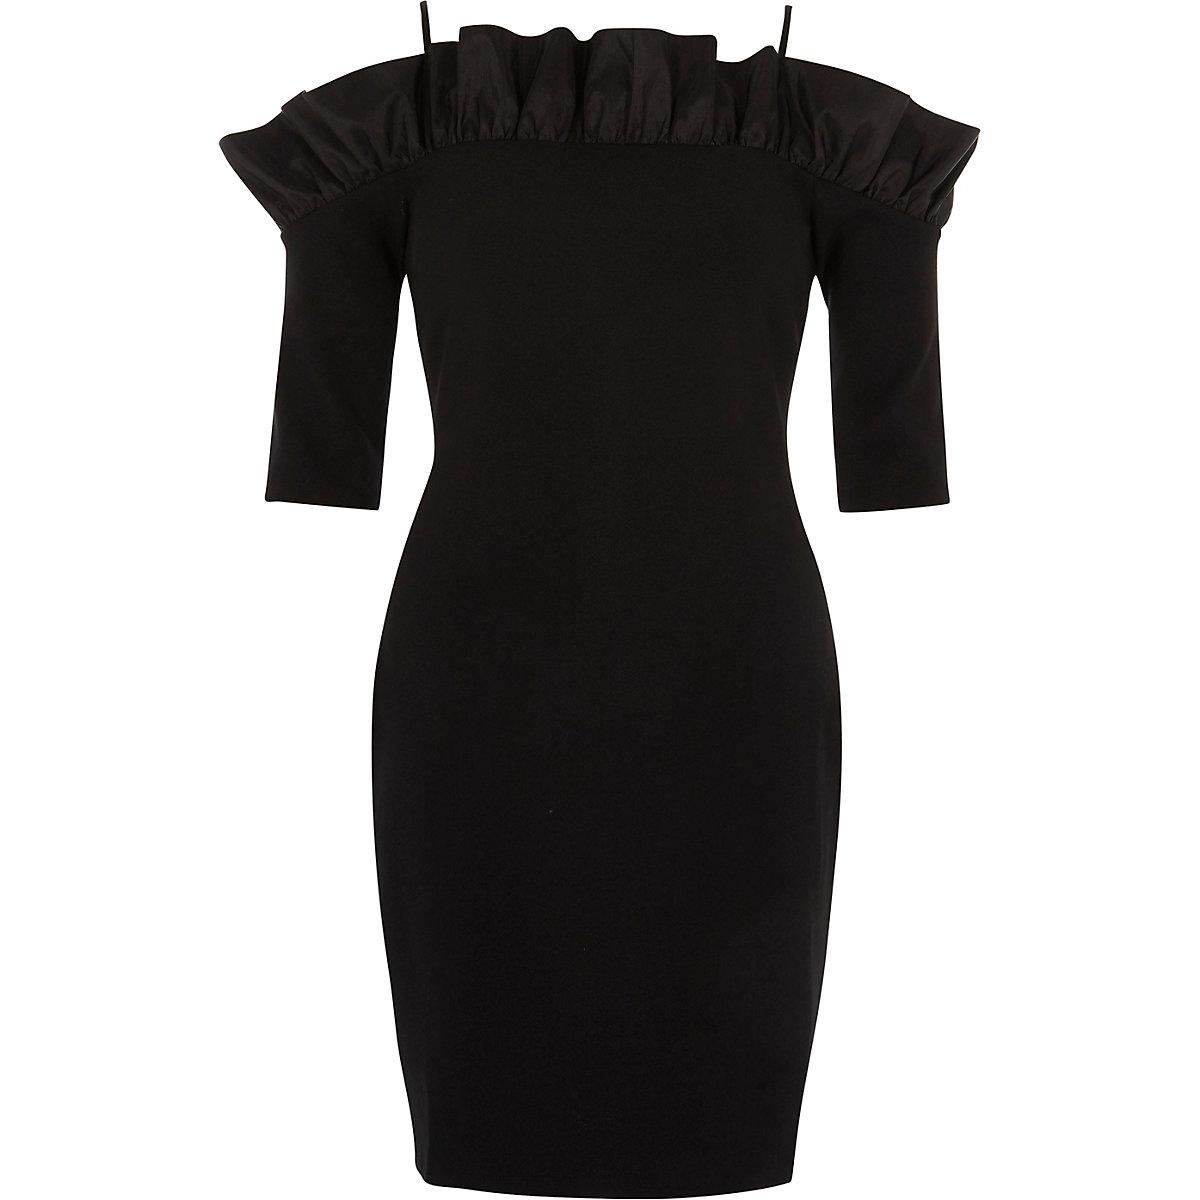 Black bardot frill bodycon mini dress